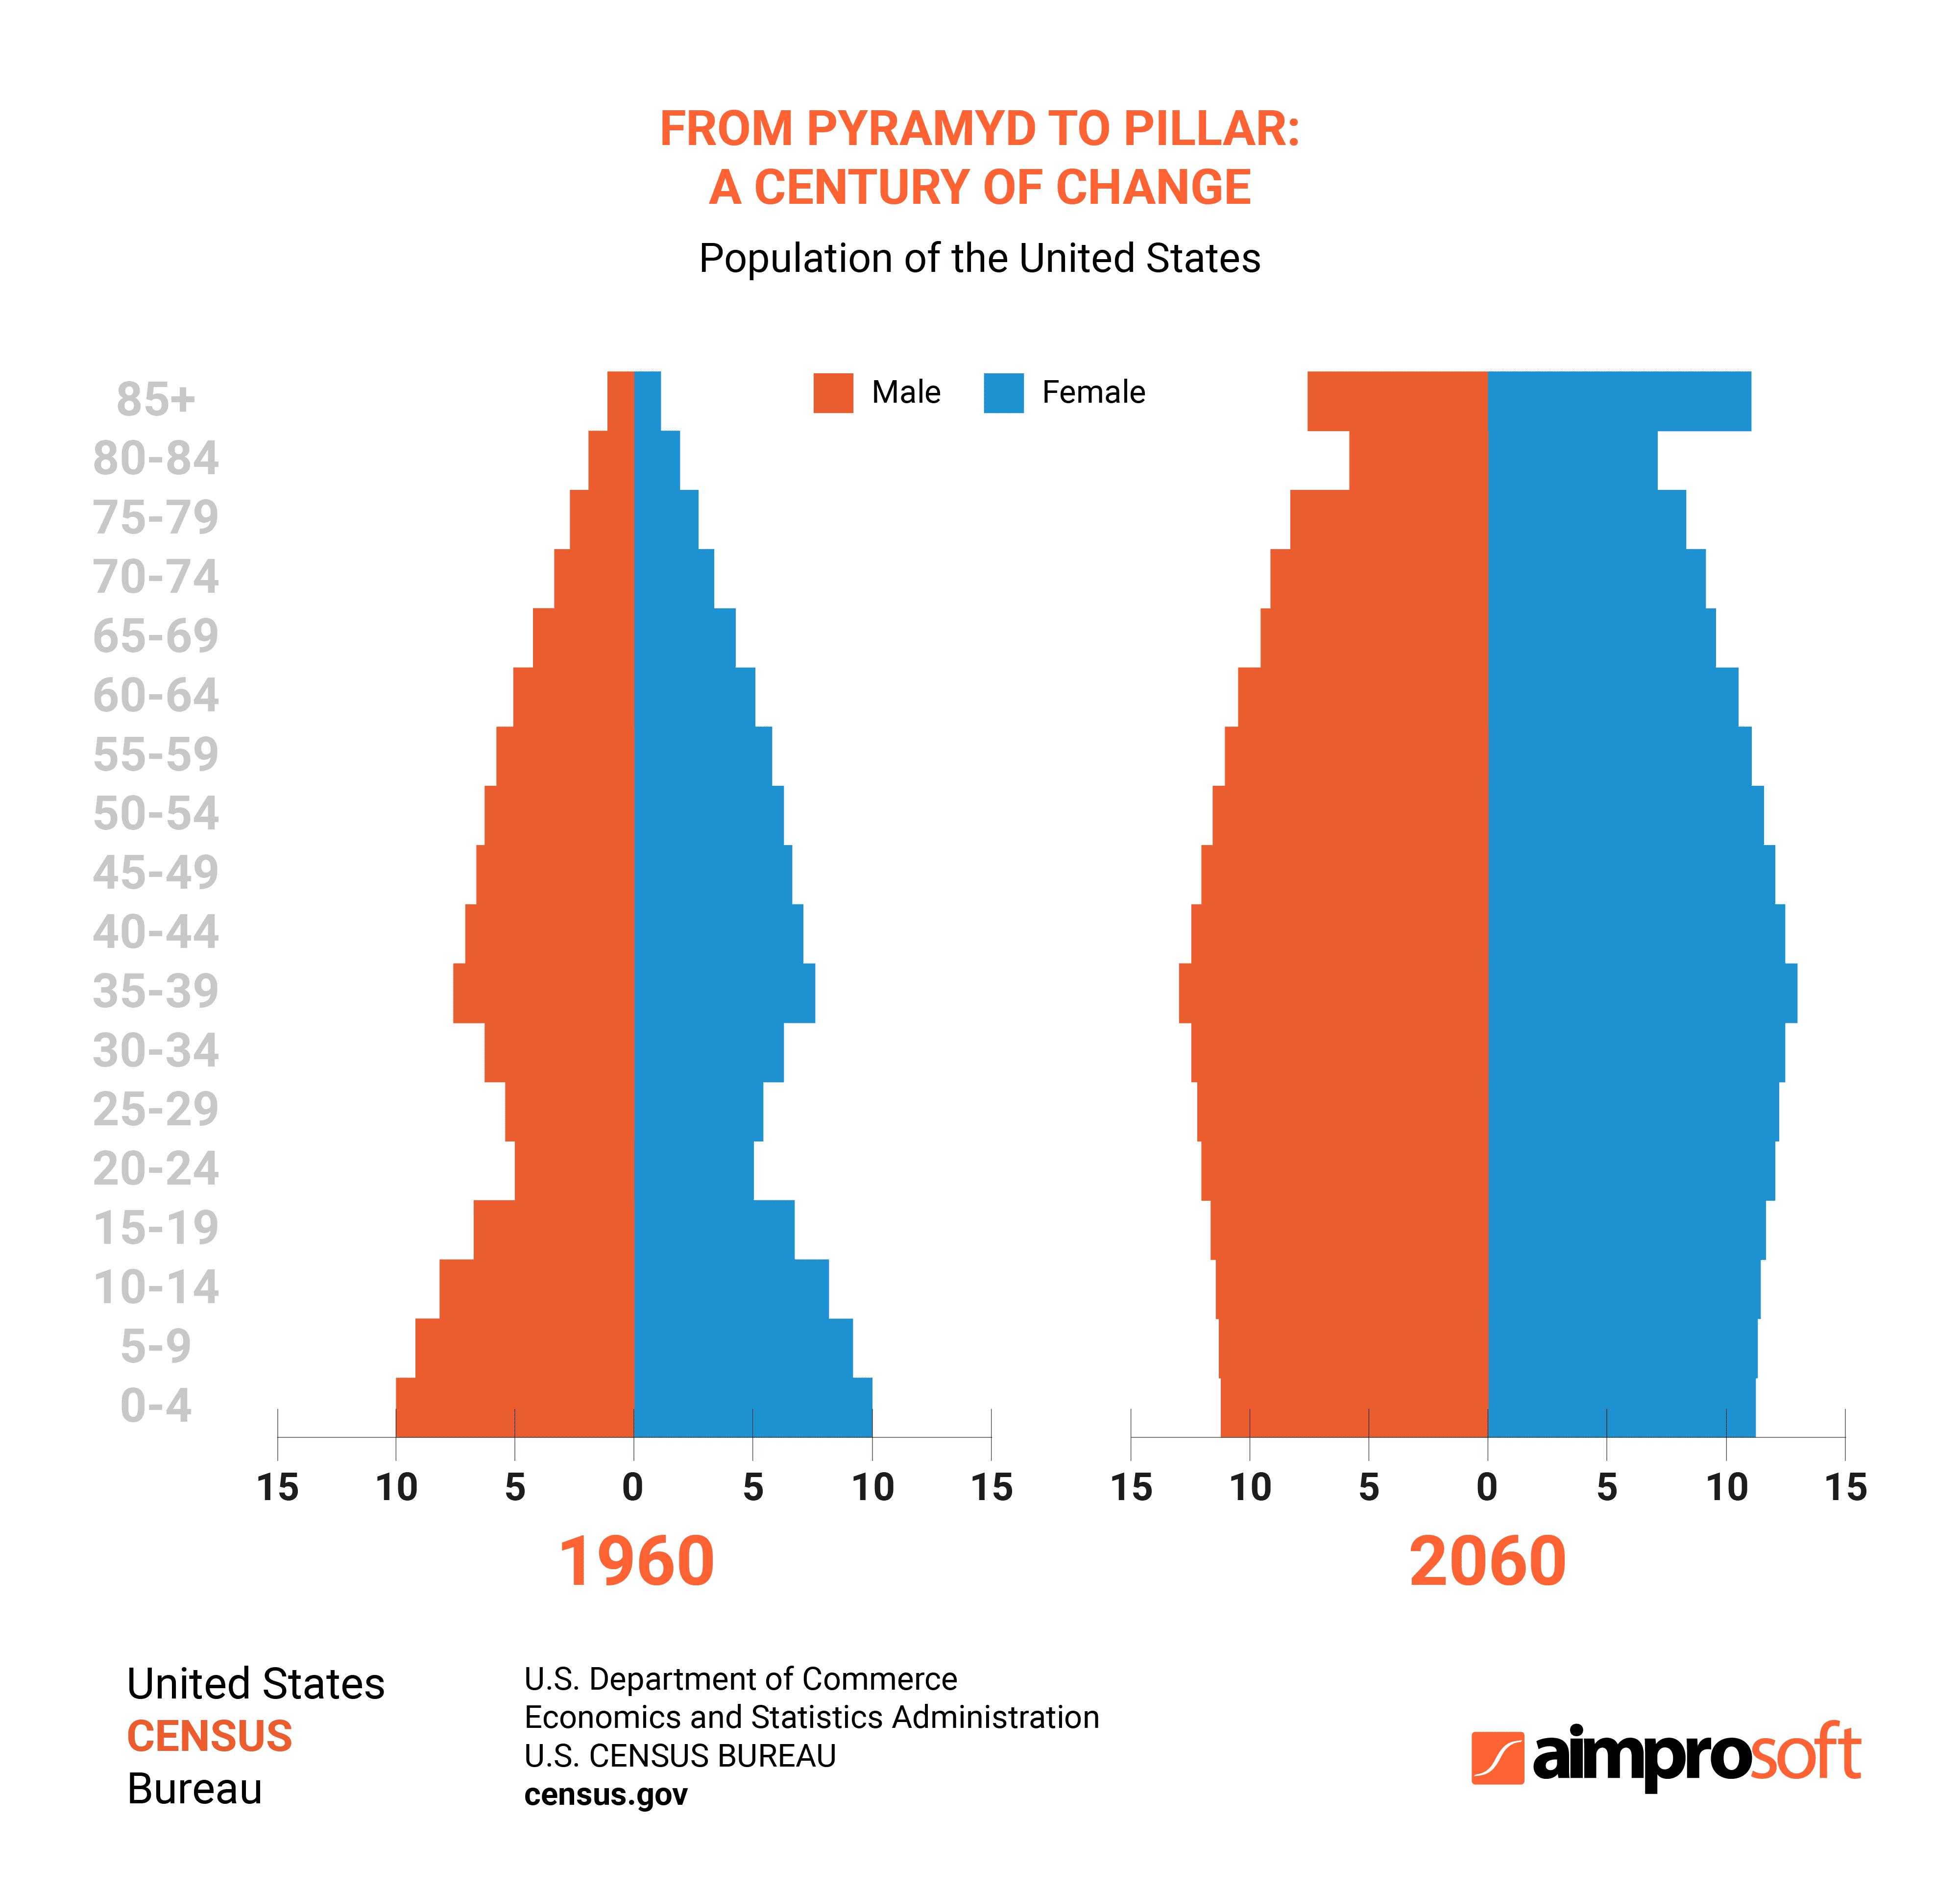 Statistics of US population between 1960 and 2060